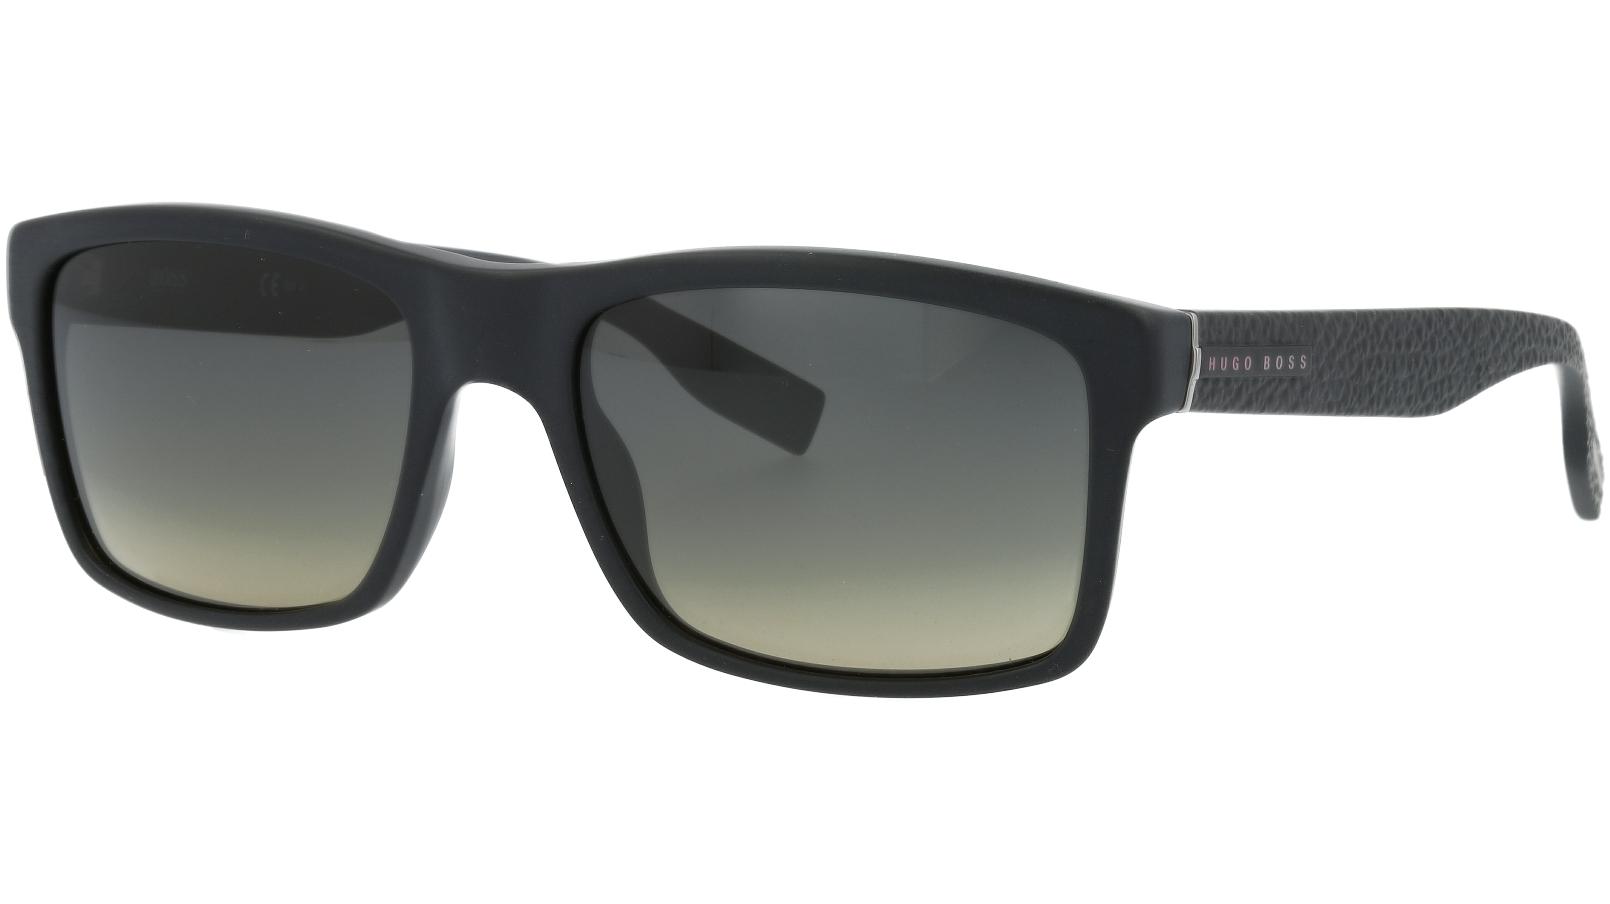 Hugo Boss BOSS0509/N/S 003 55 Matt Sunglasses